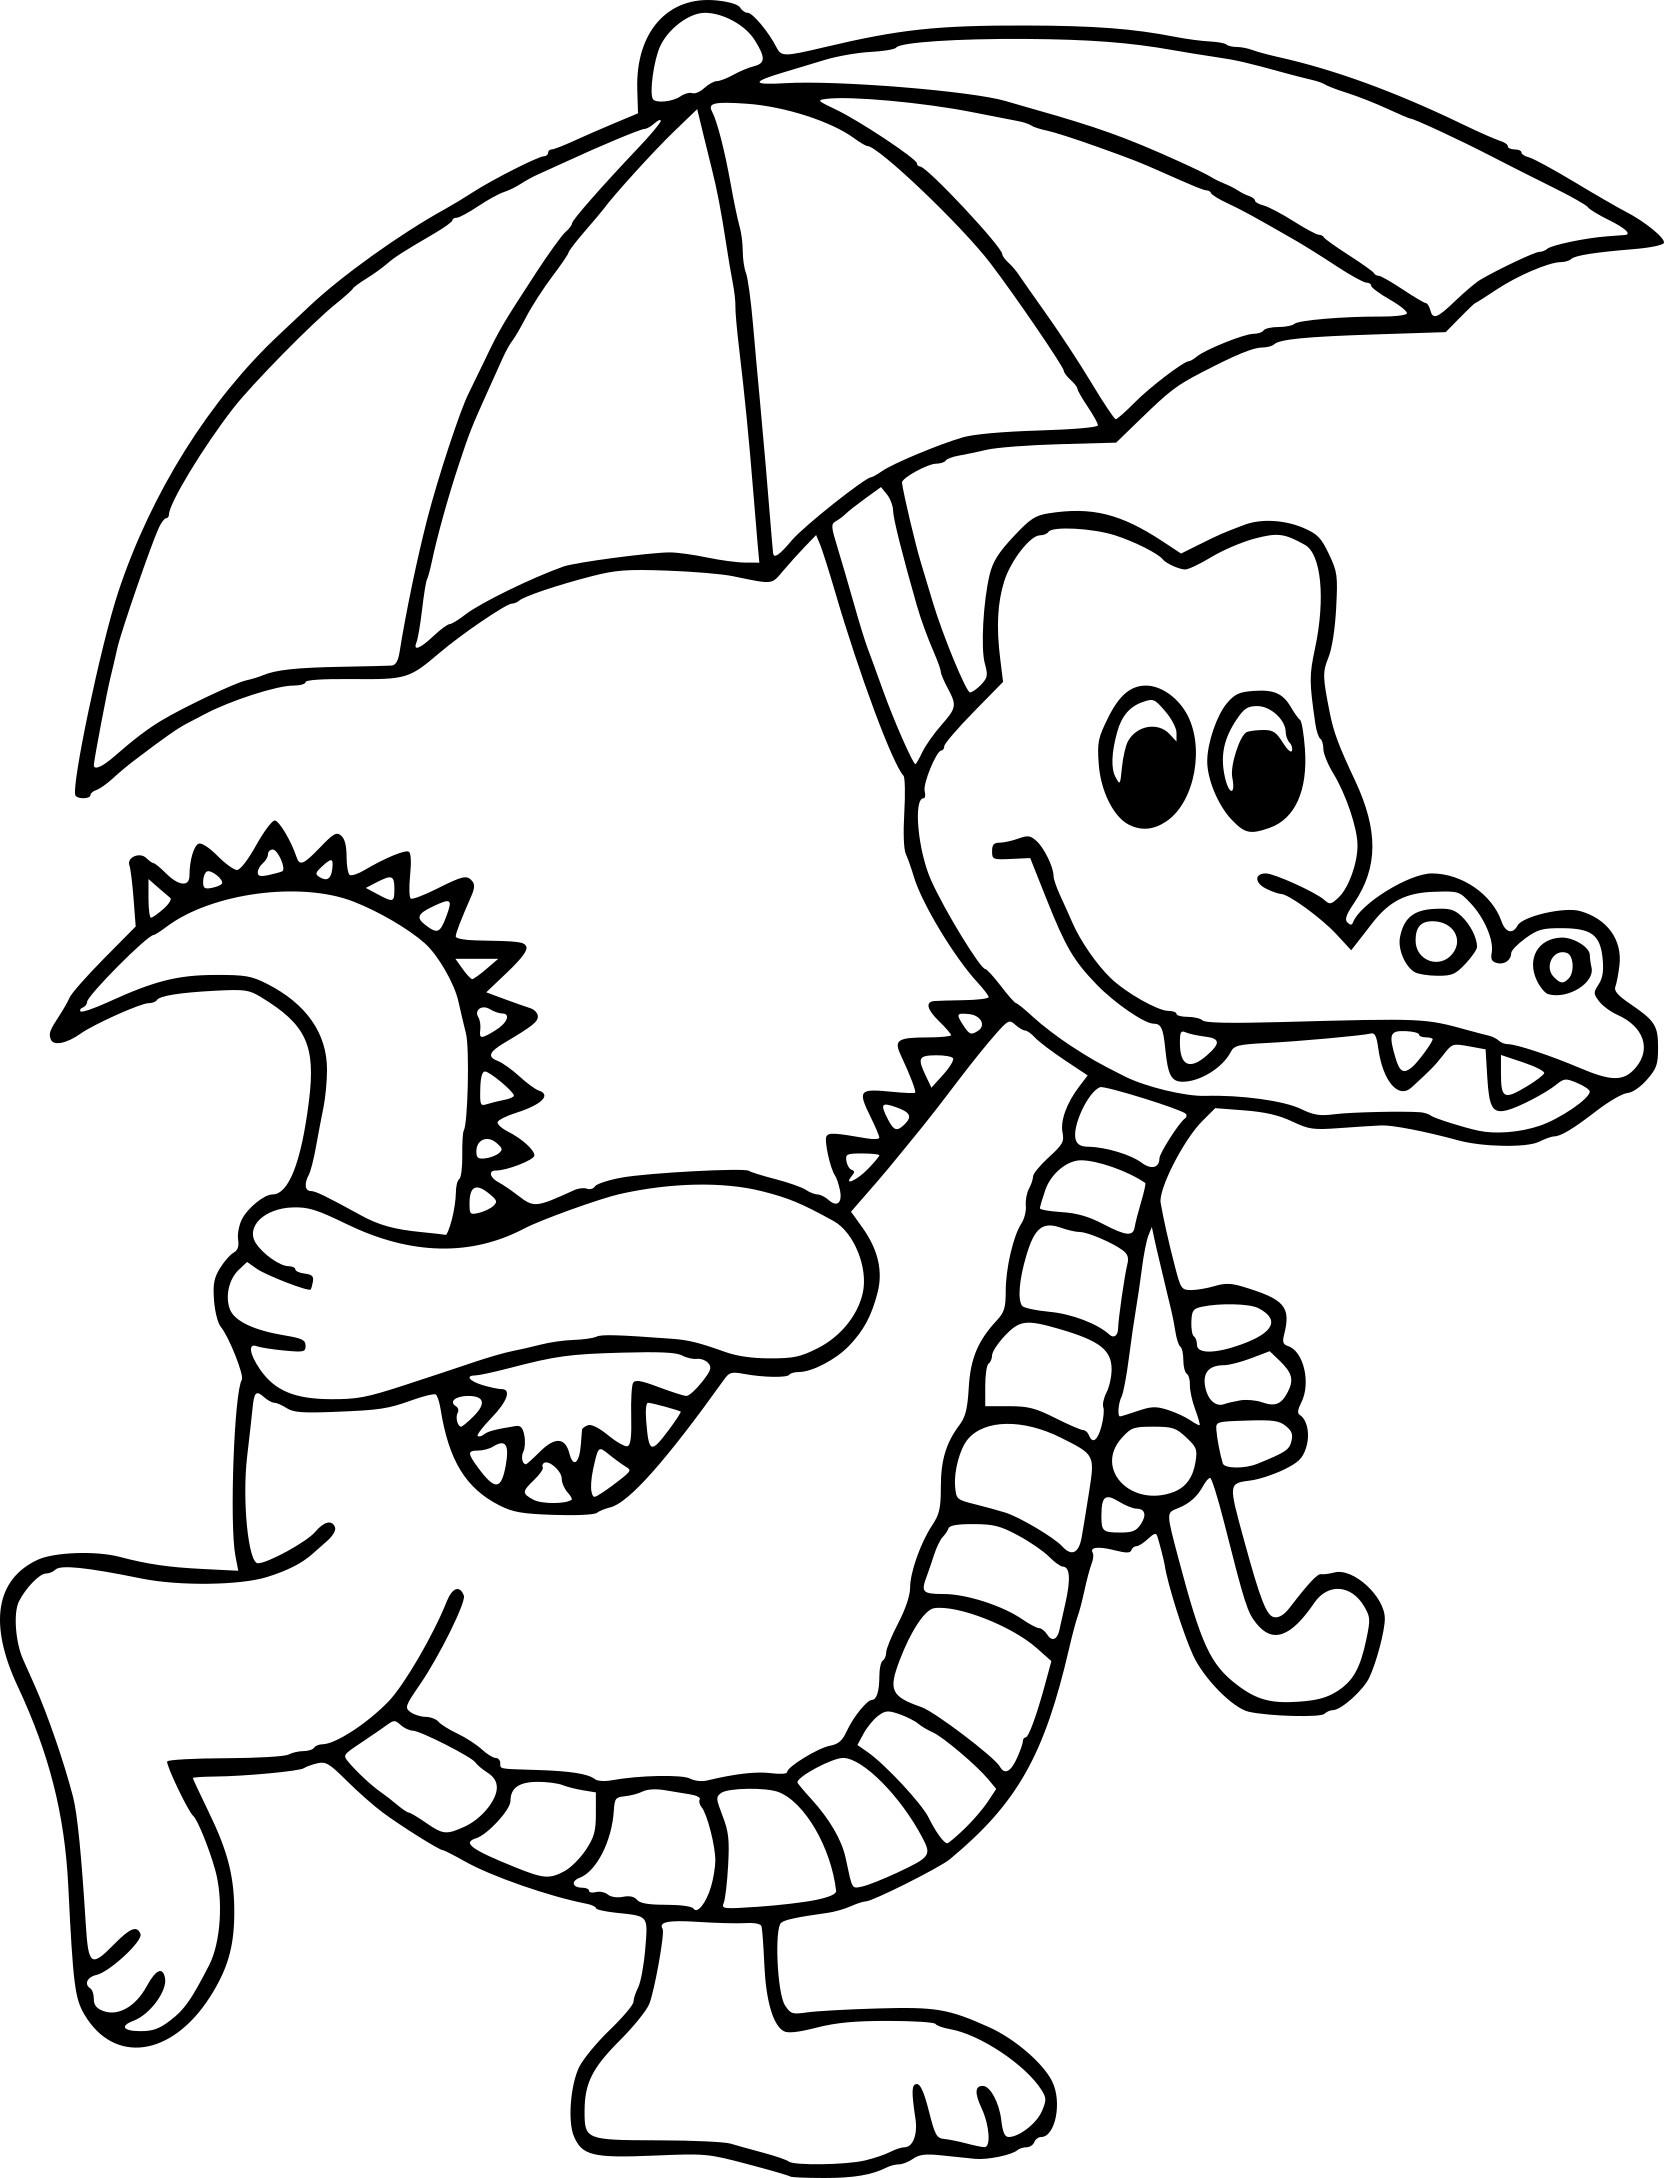 Coloriage Crocodile Mechant.Fresh Coloriage Crocodile A Imprimer Gratuit Inspirant Coloriage